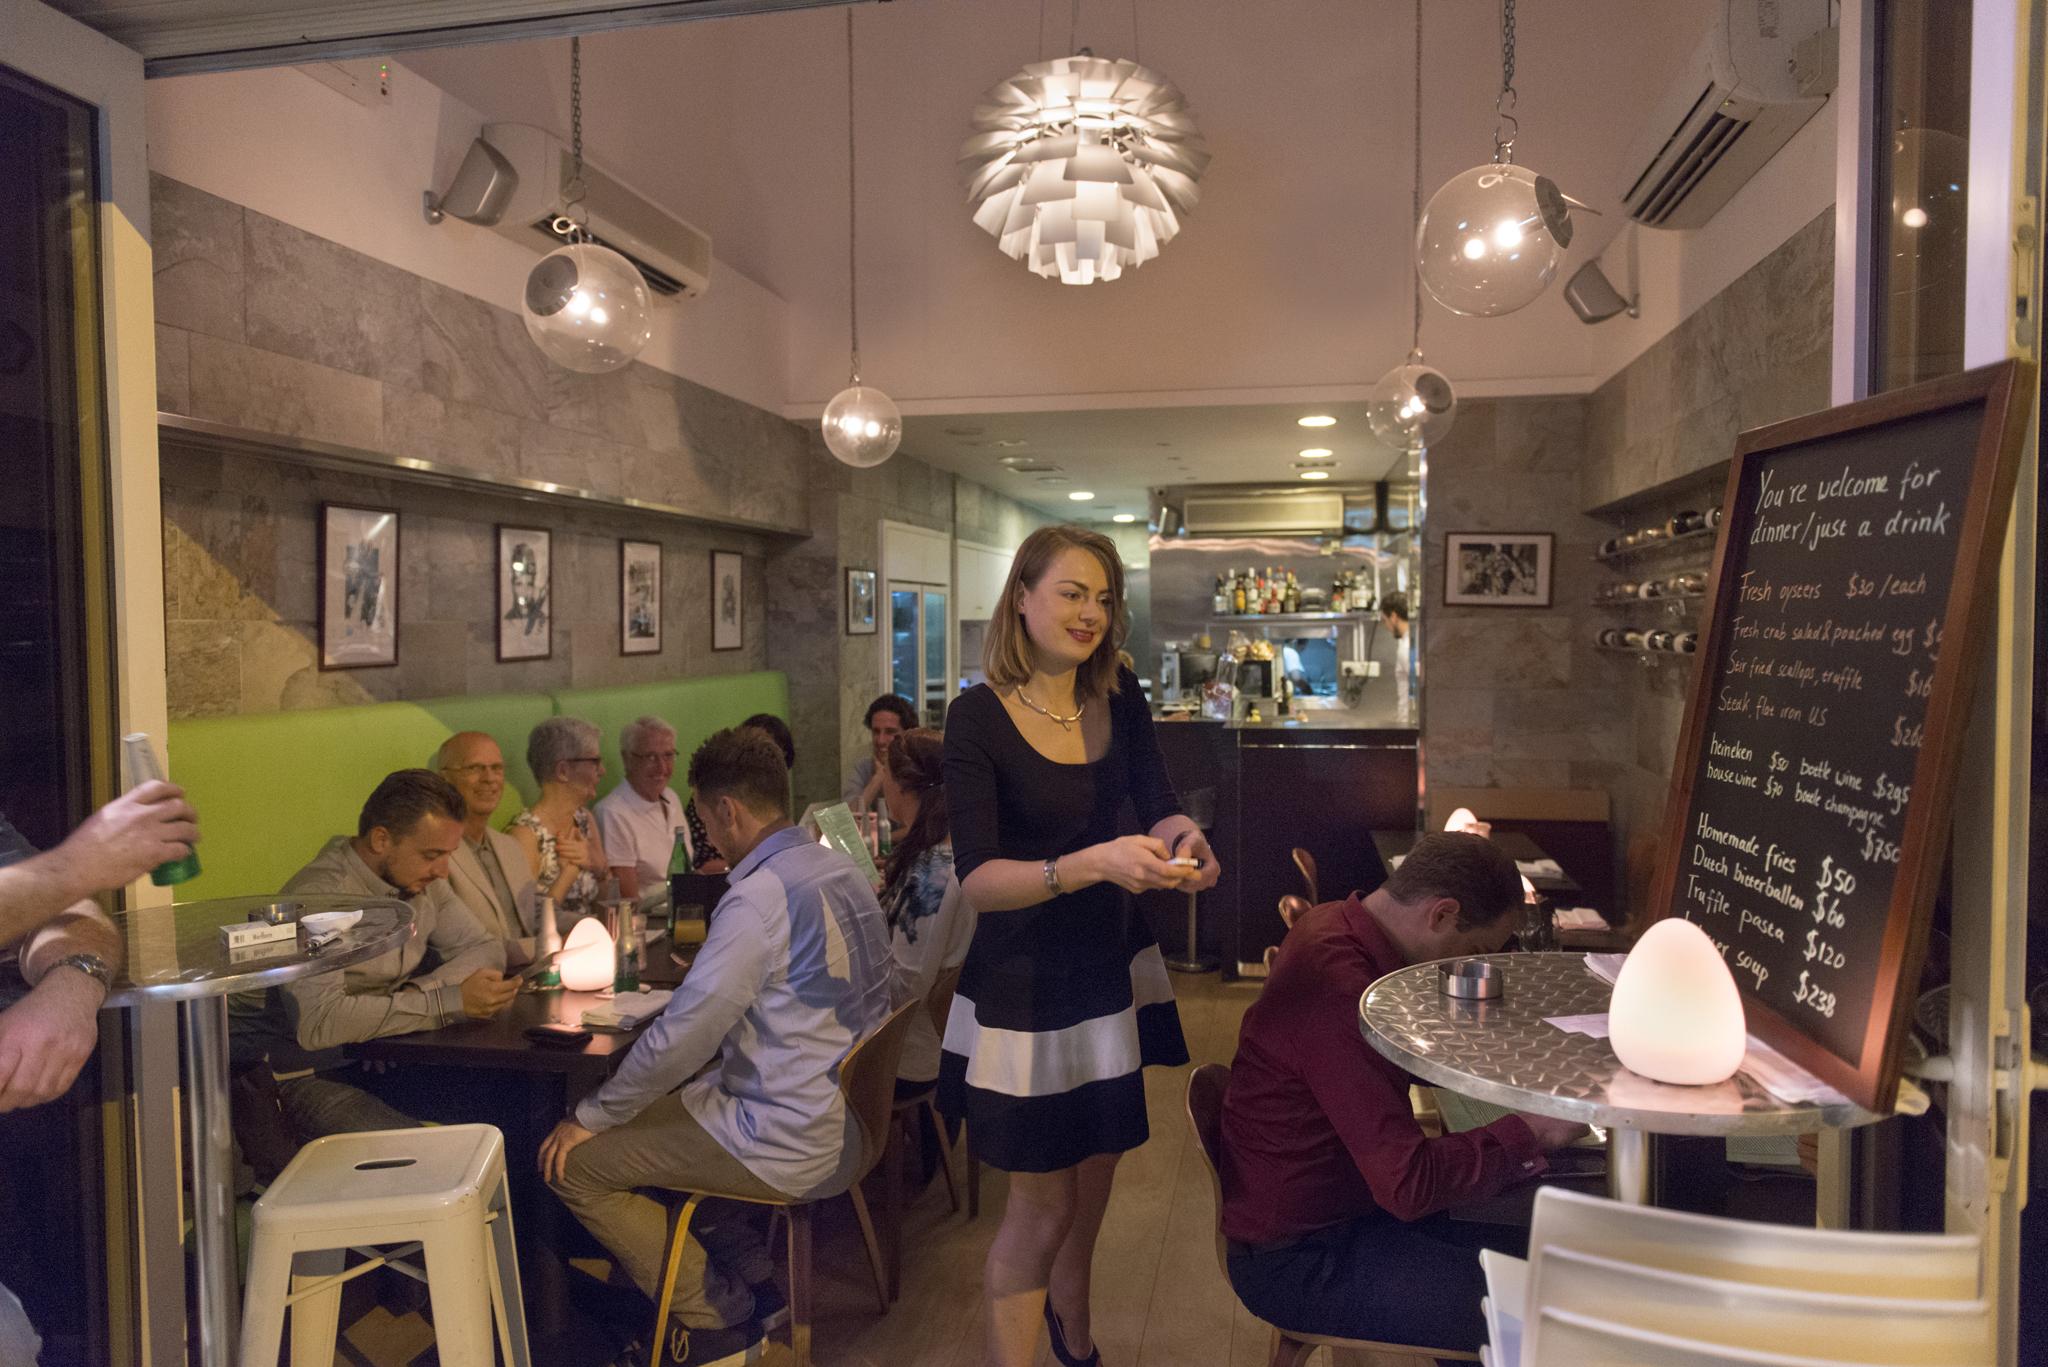 238restaurant_BAR7487LR.jpg